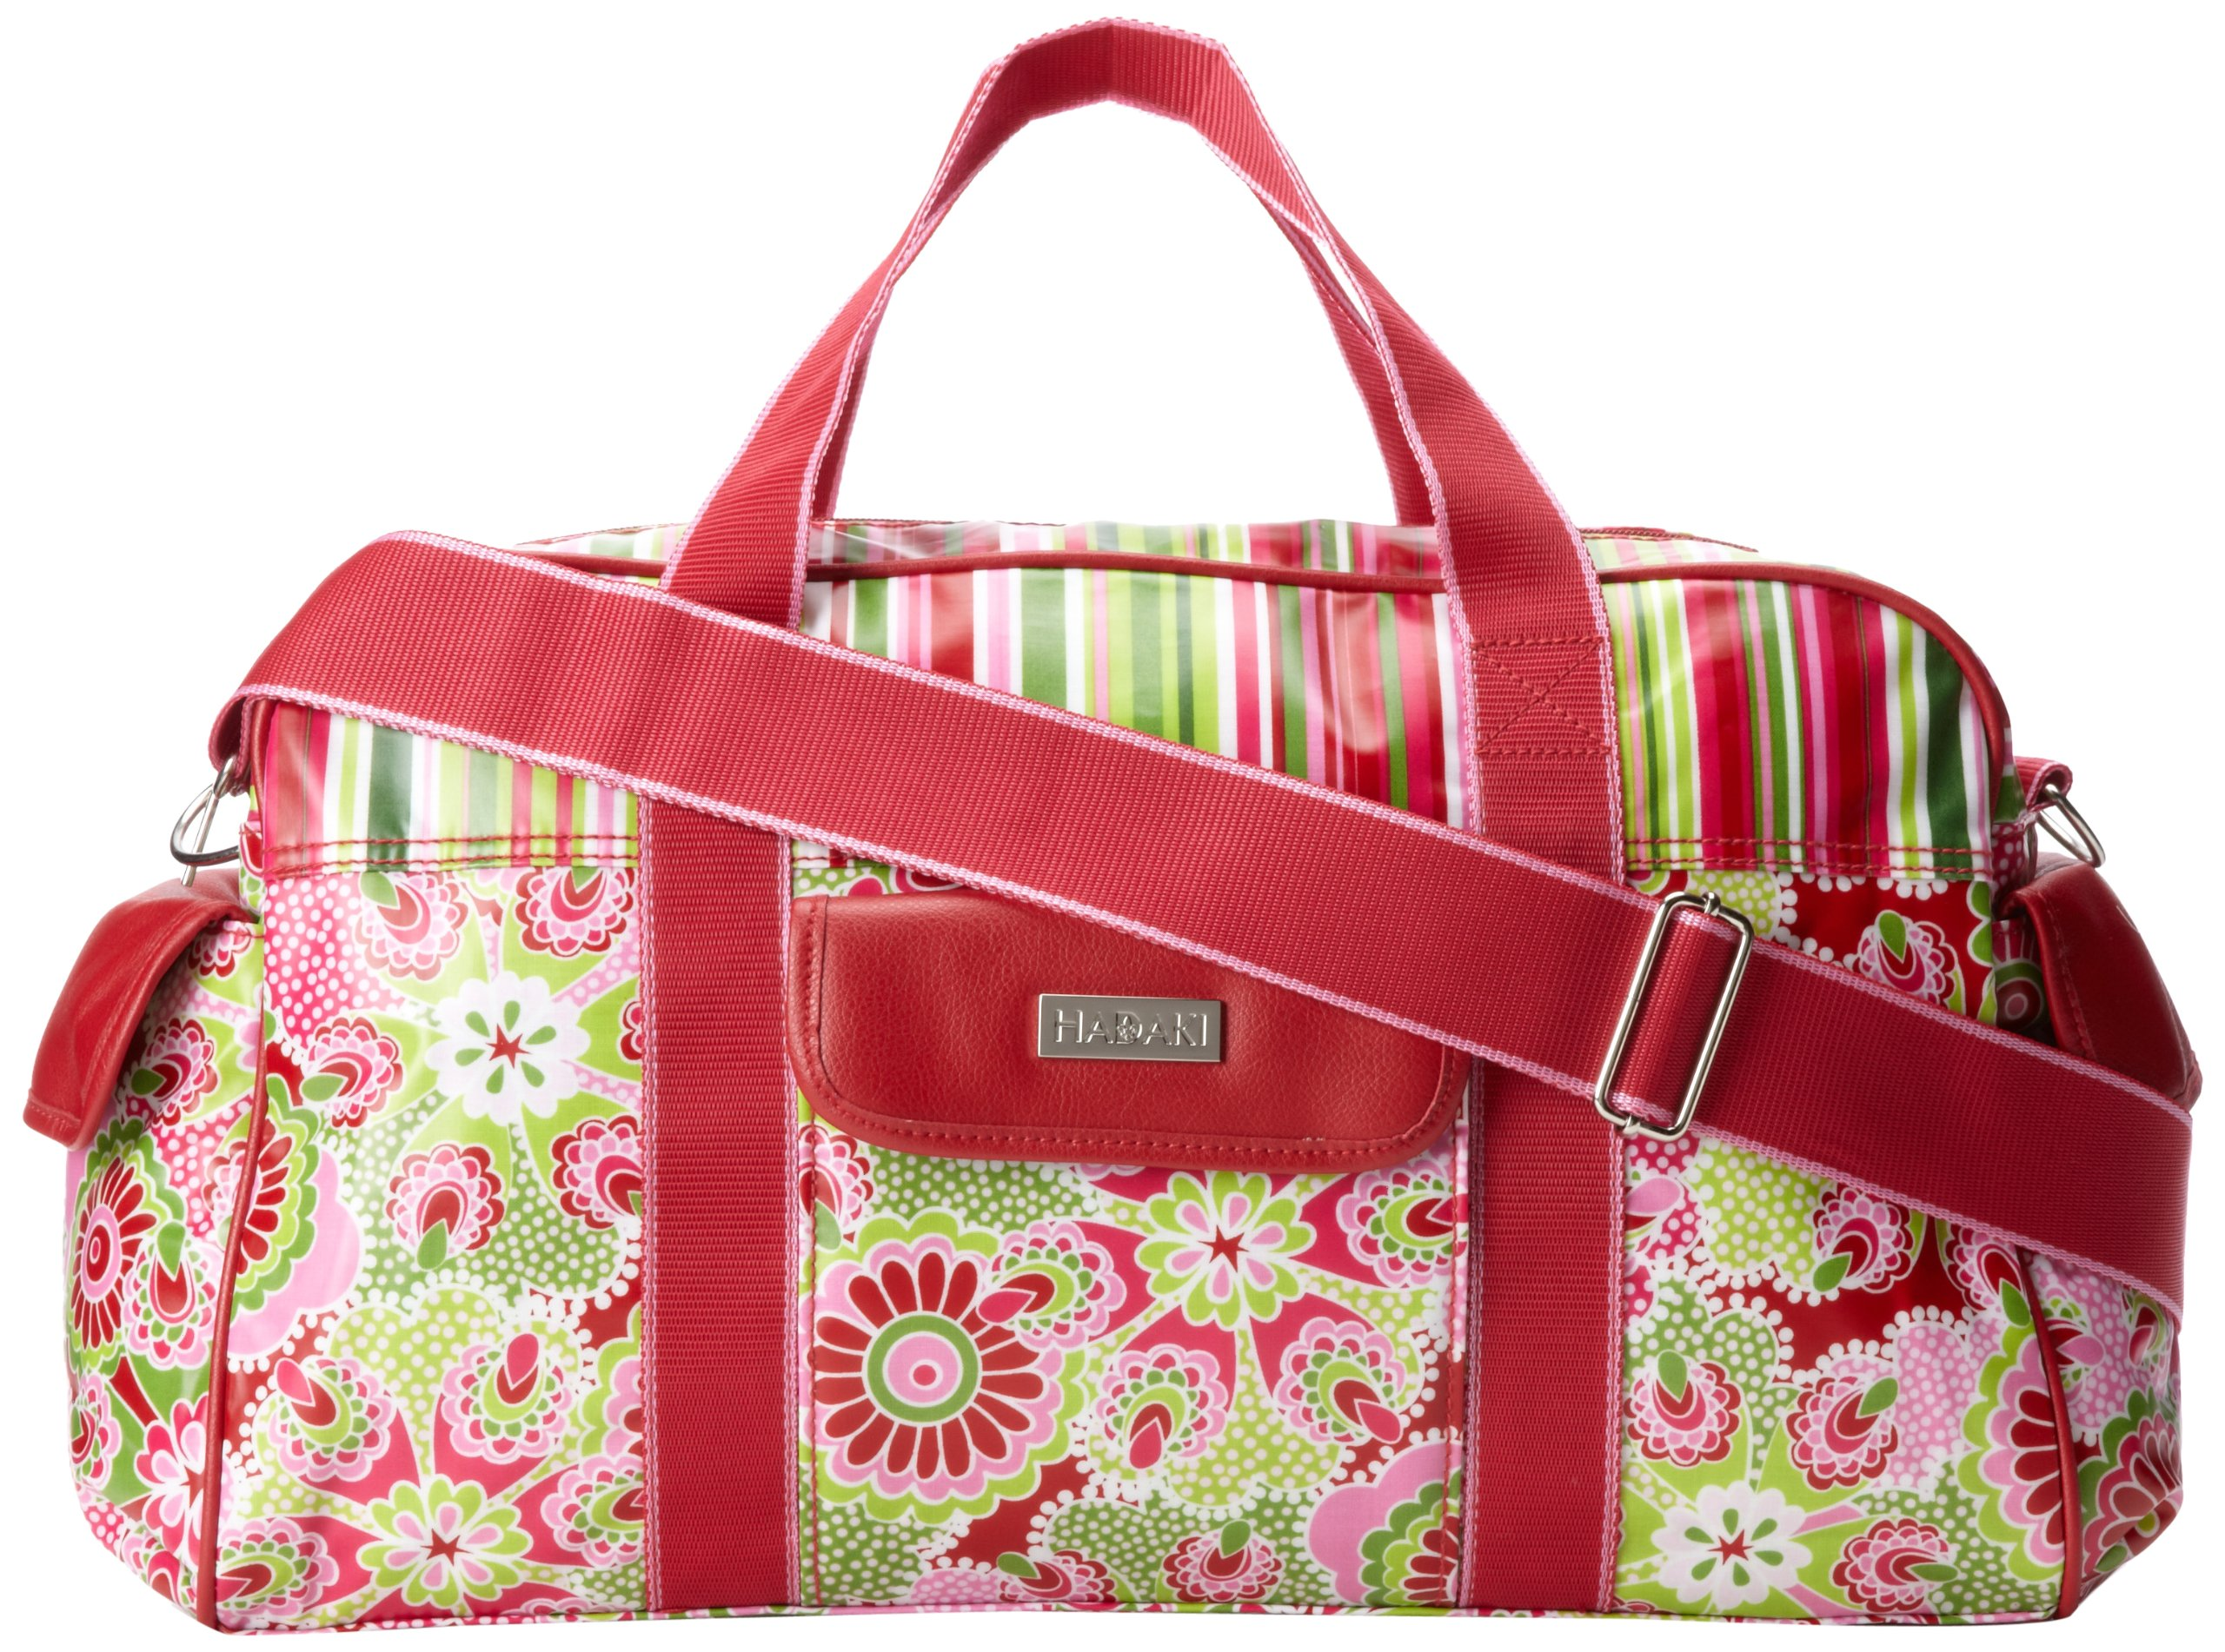 Hadaki Cool HDK826 Duffle Bag,Jazz Ruby,One Size by HADAKI (Image #1)